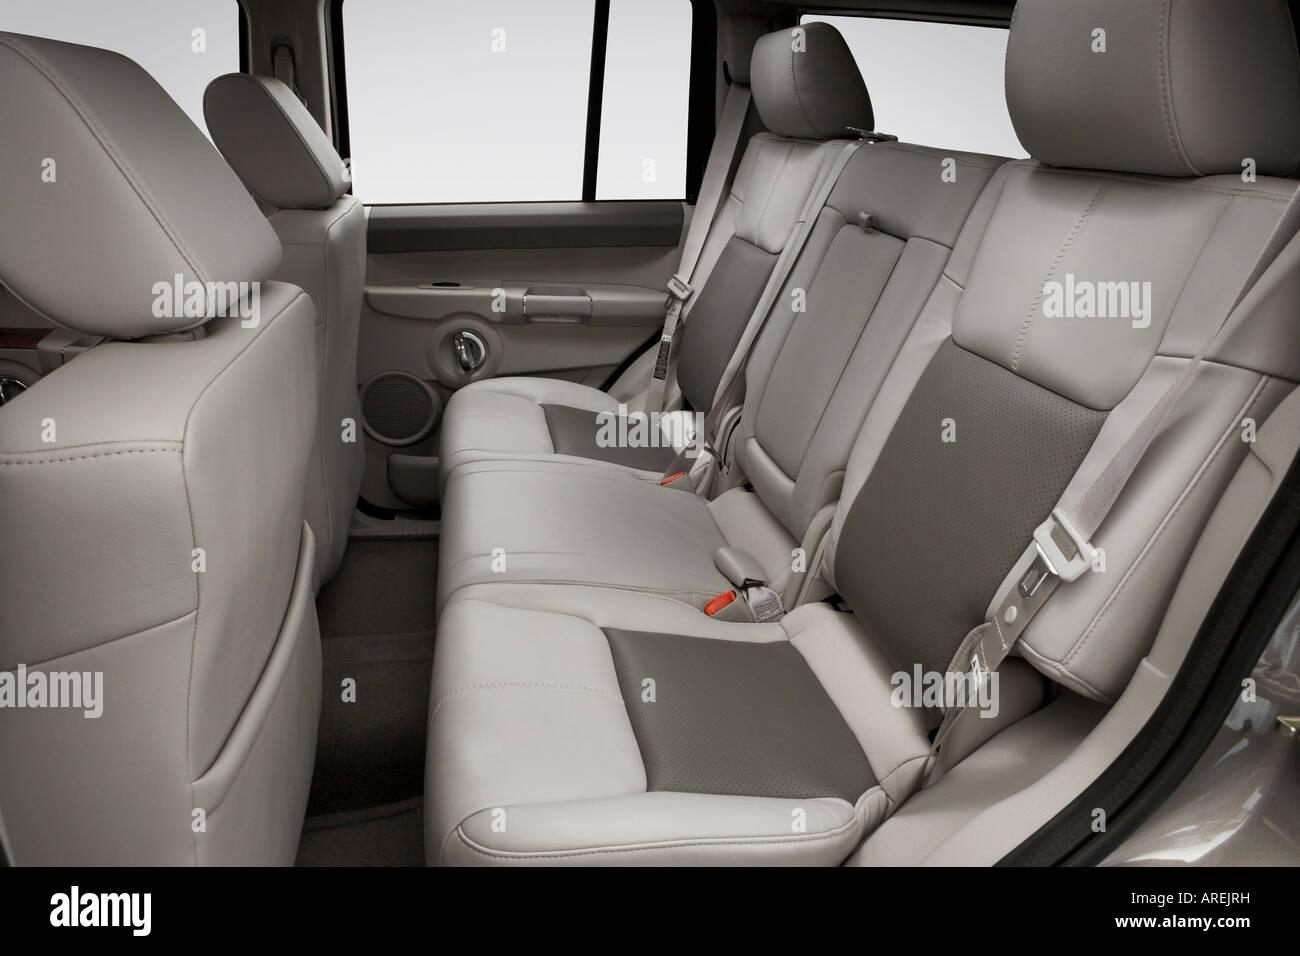 2006 Jeep Commander Limited In Beige Rear Seats Stock Photo